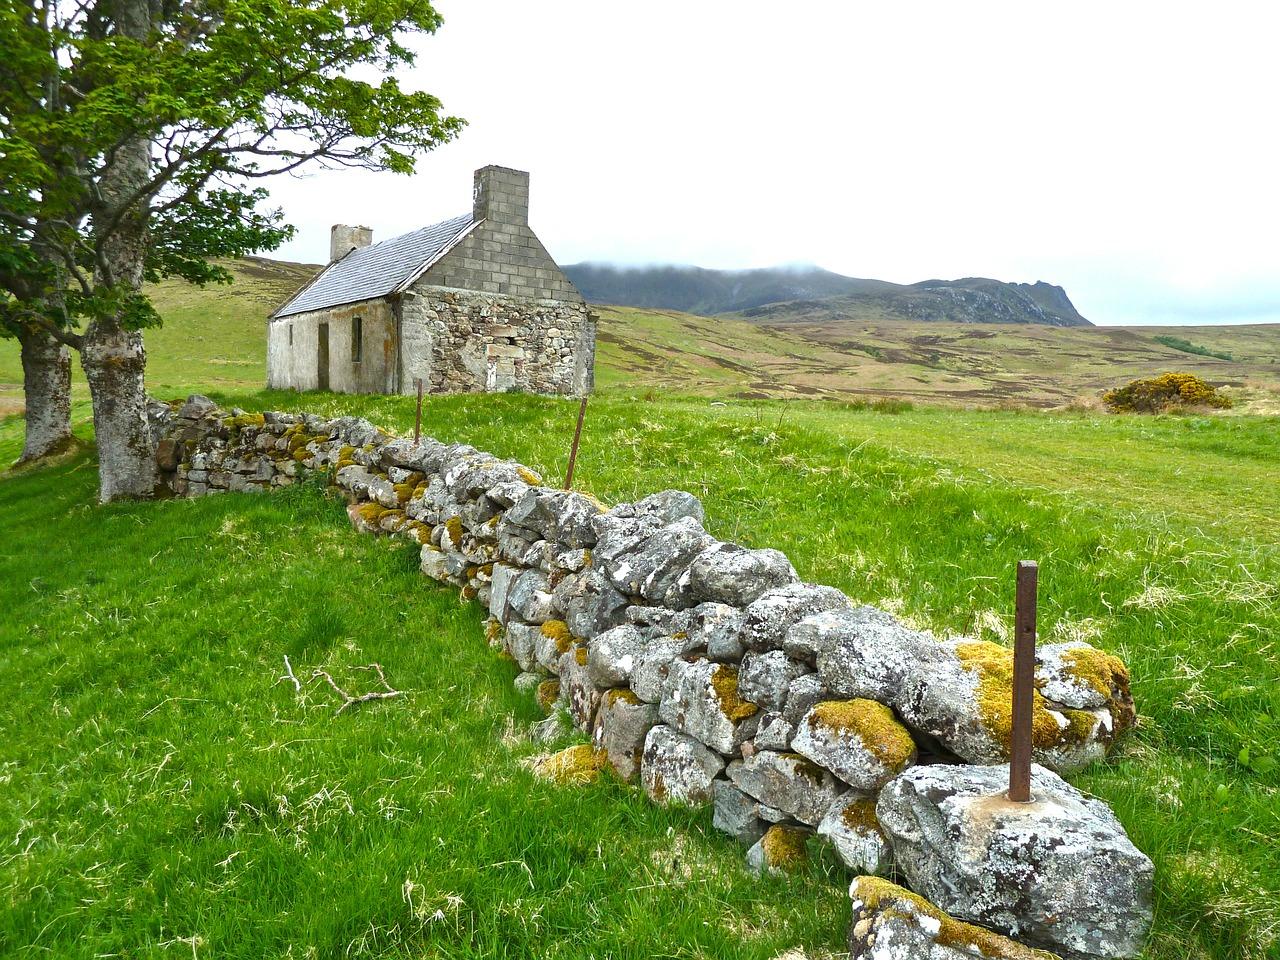 farmhouse-272596_1280.jpg